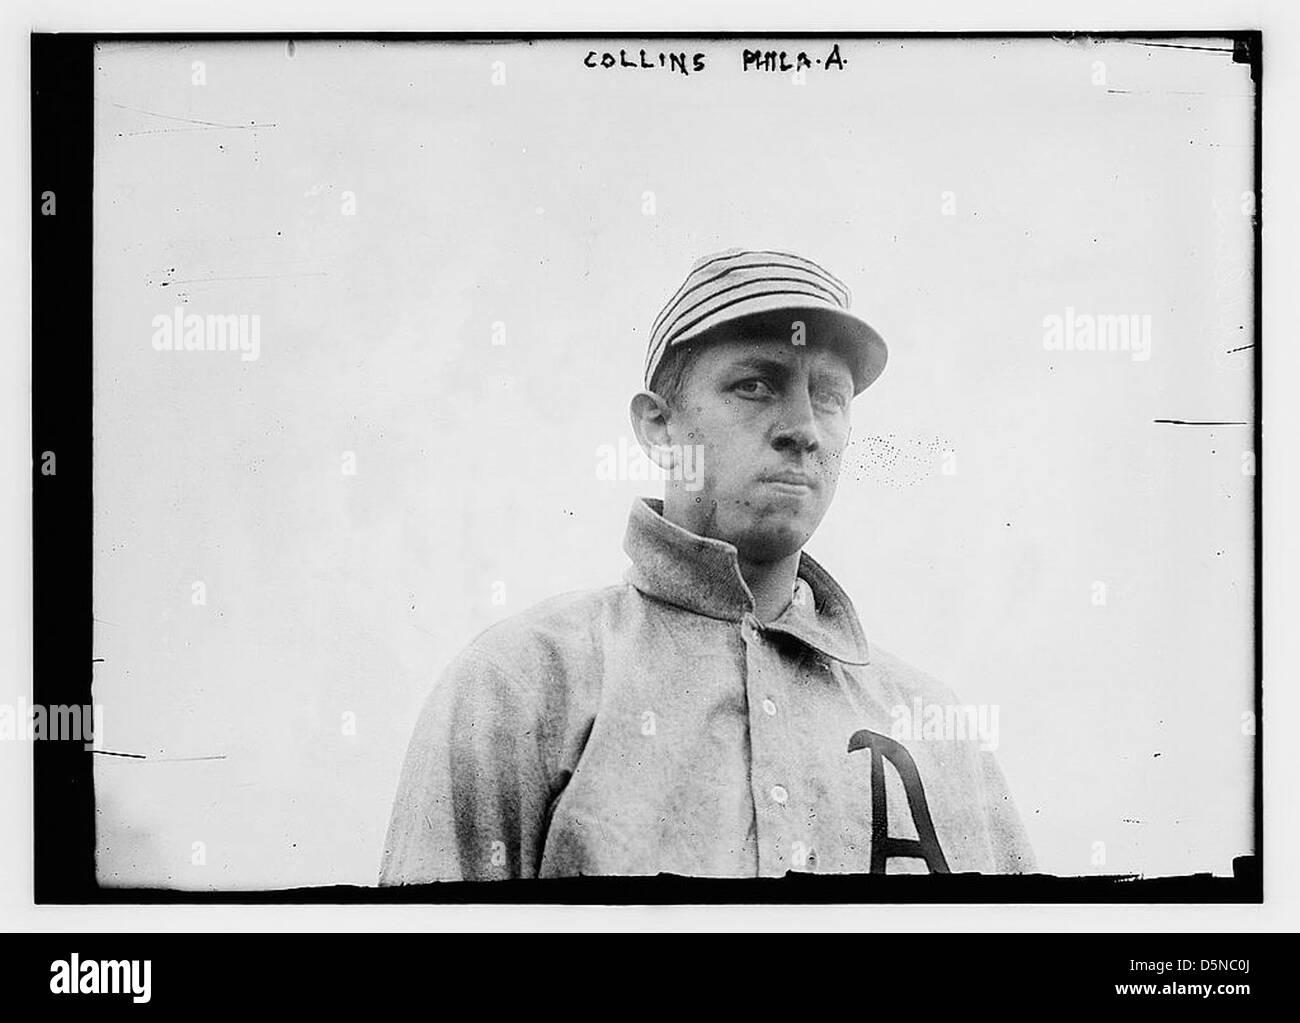 [Eddie Collins, Filadelfia, al (béisbol)] (LOC) Imagen De Stock